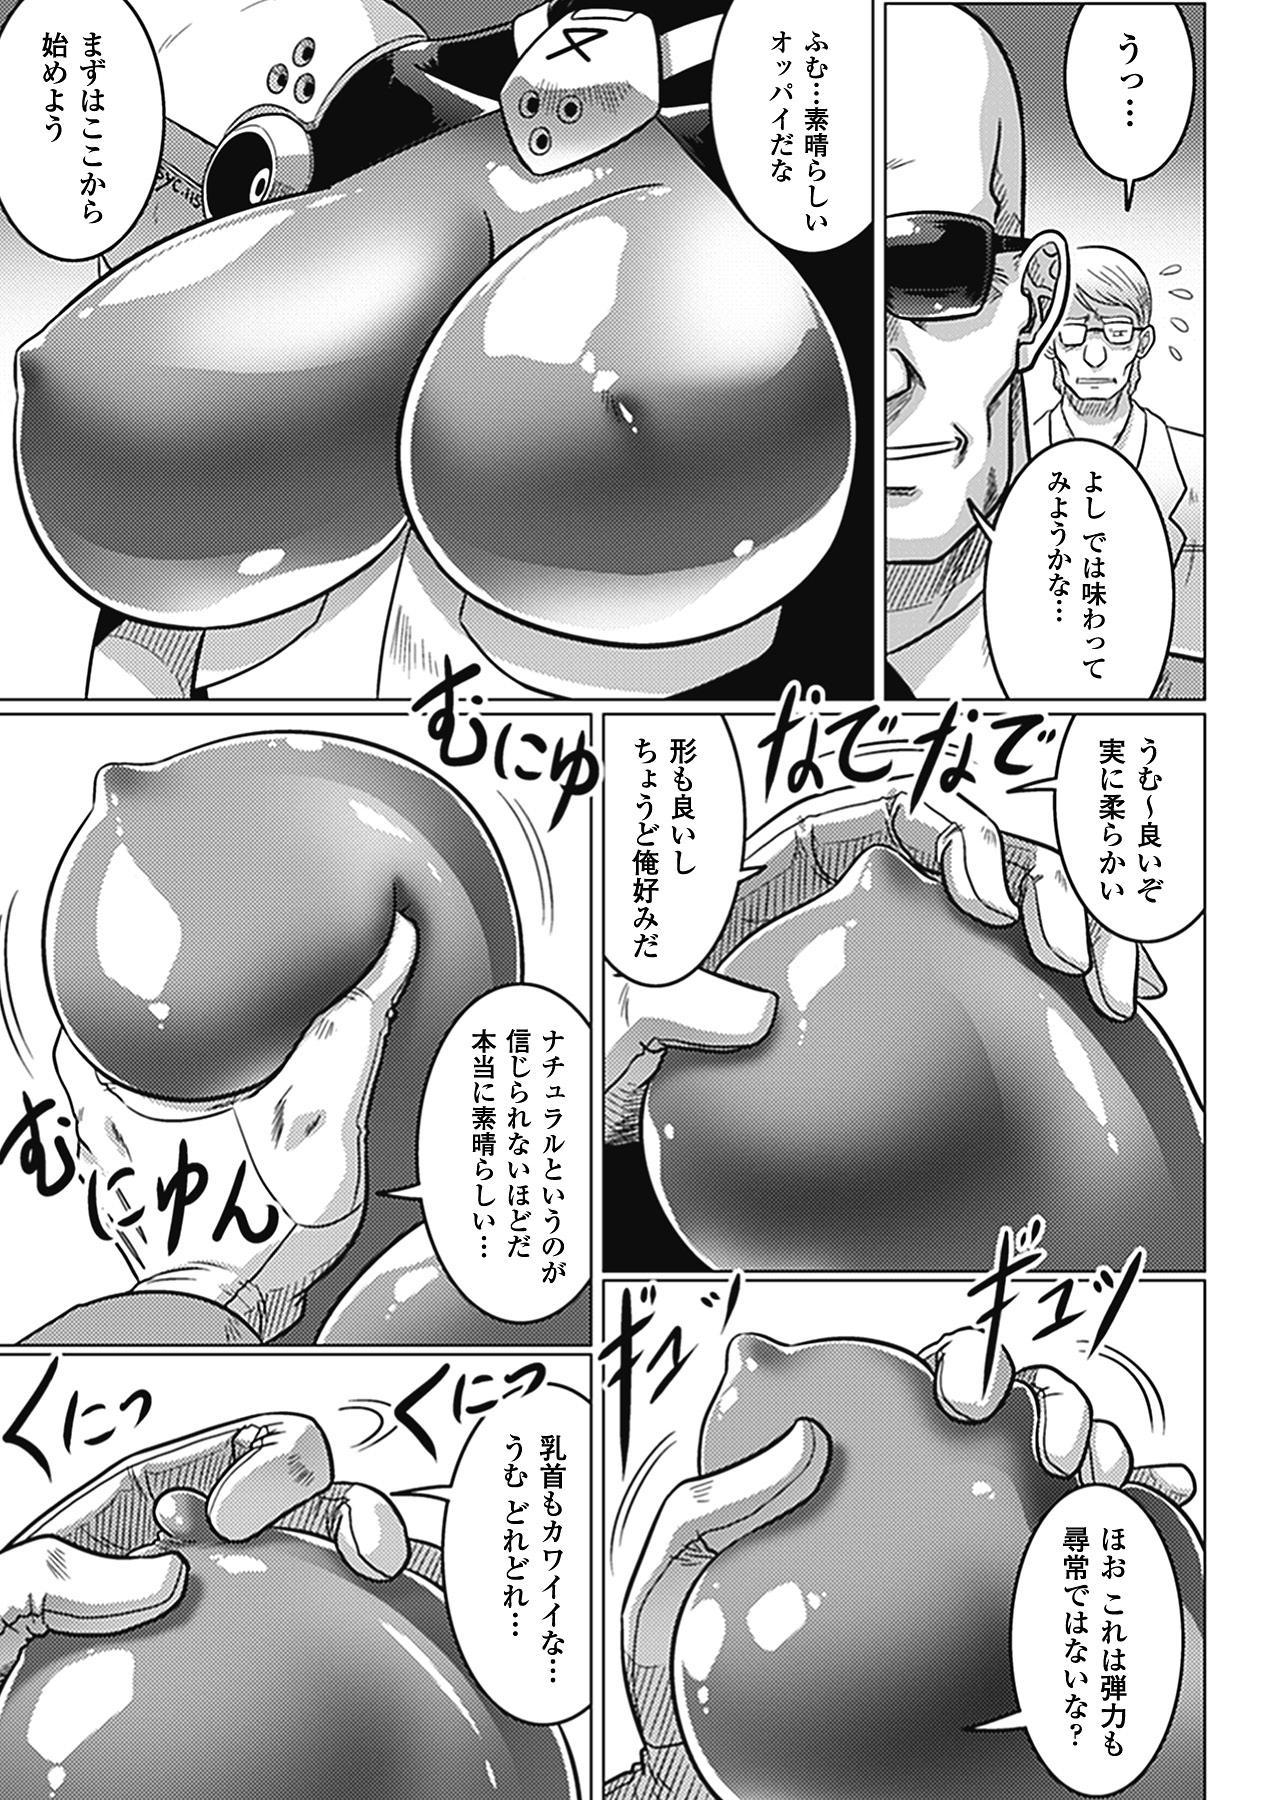 Megami Crisis 5 106